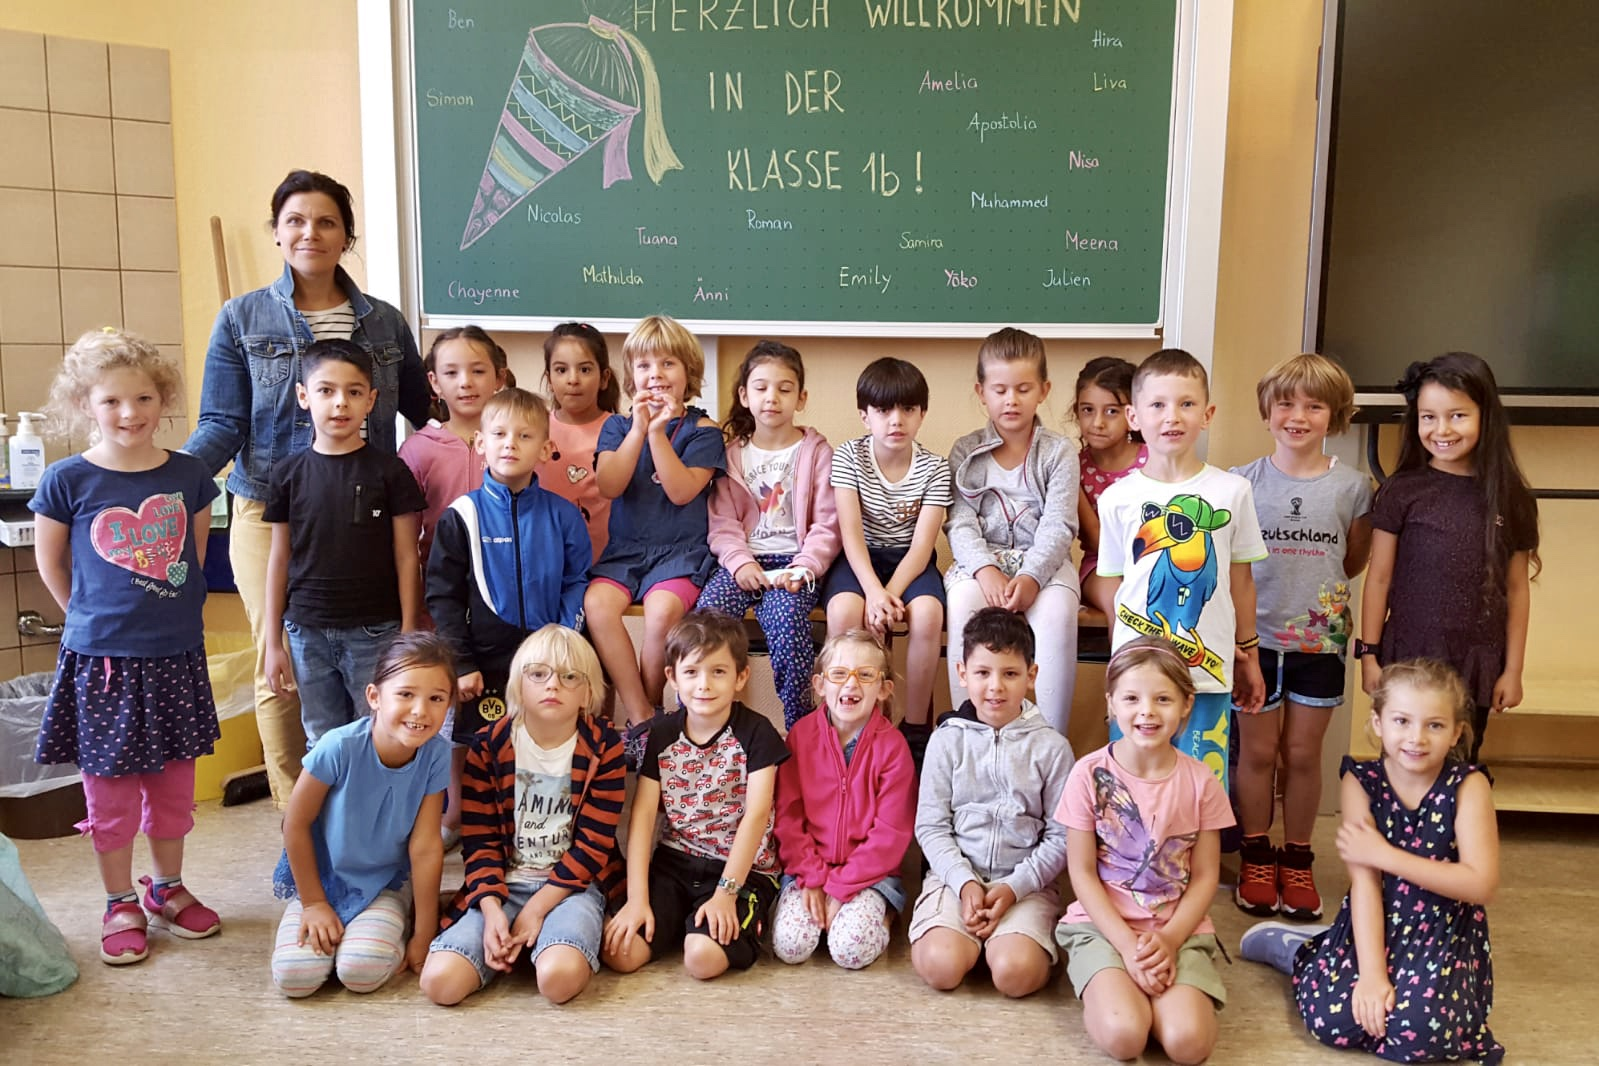 Klasse 1b mit Klassenlehrerin Frau Vasiliauskaite